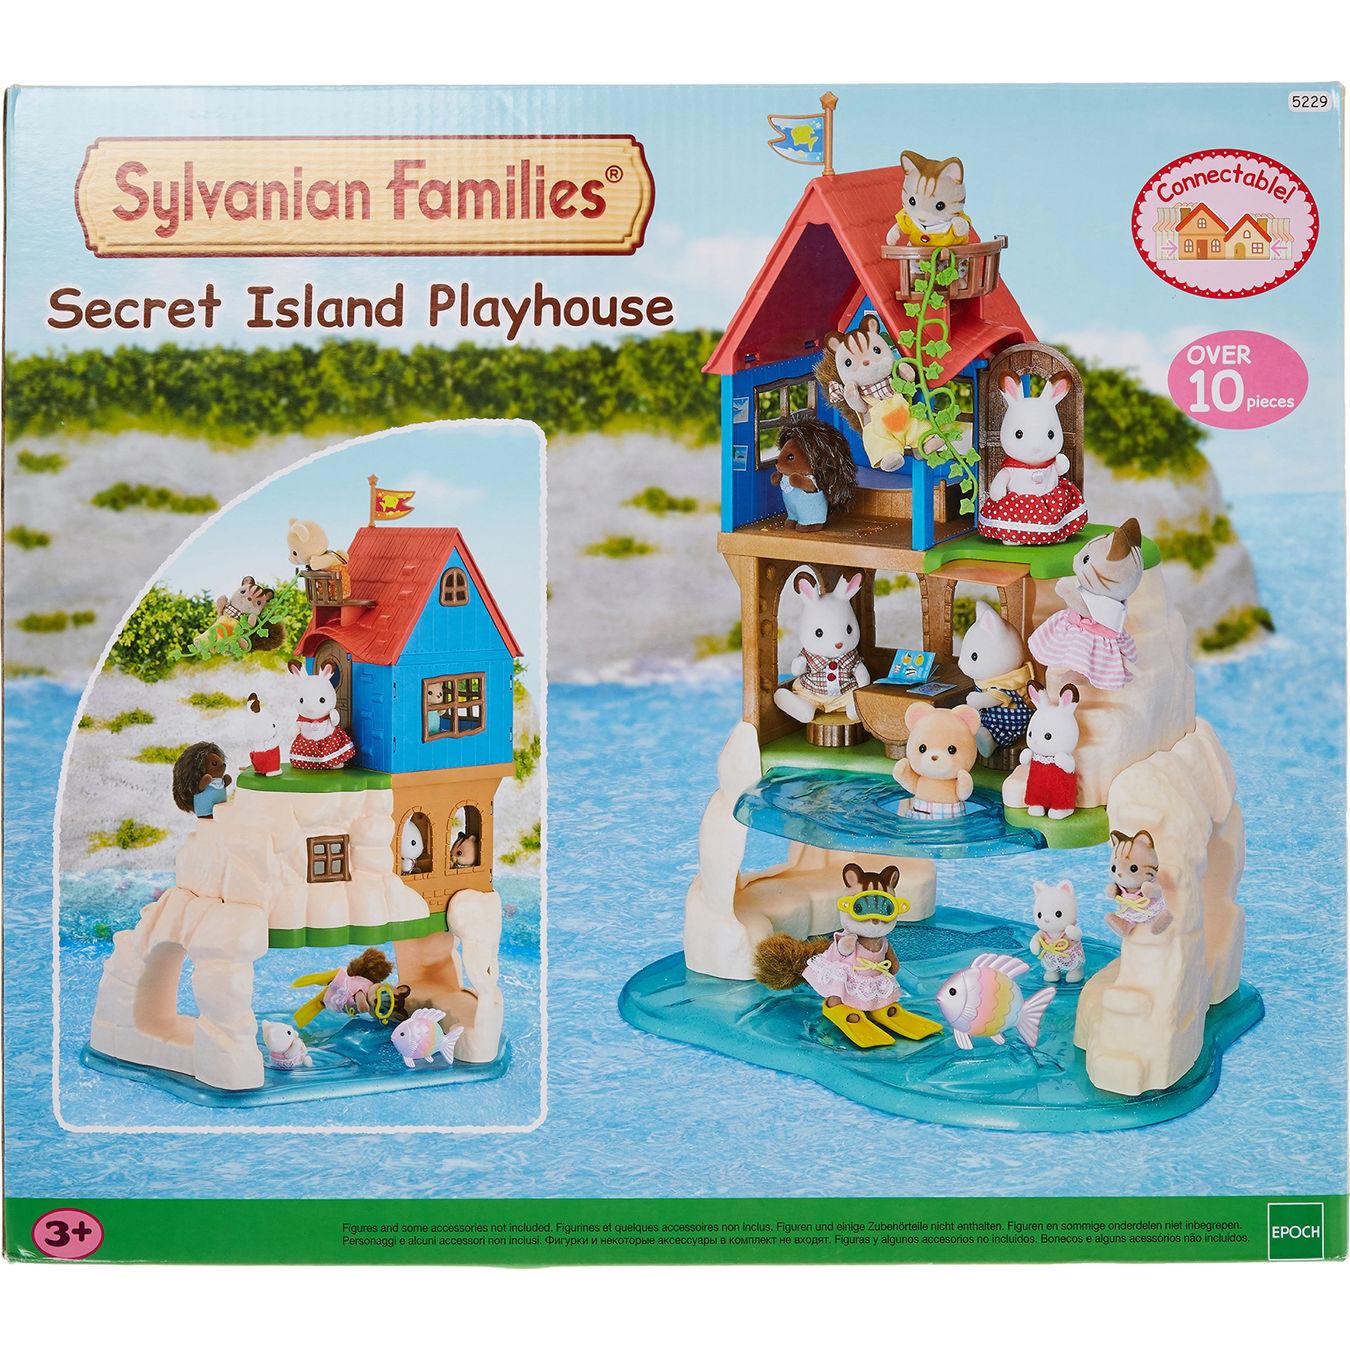 Sylvanian families playhouse - £19 @ TK Maxx (plus £3.99 del)